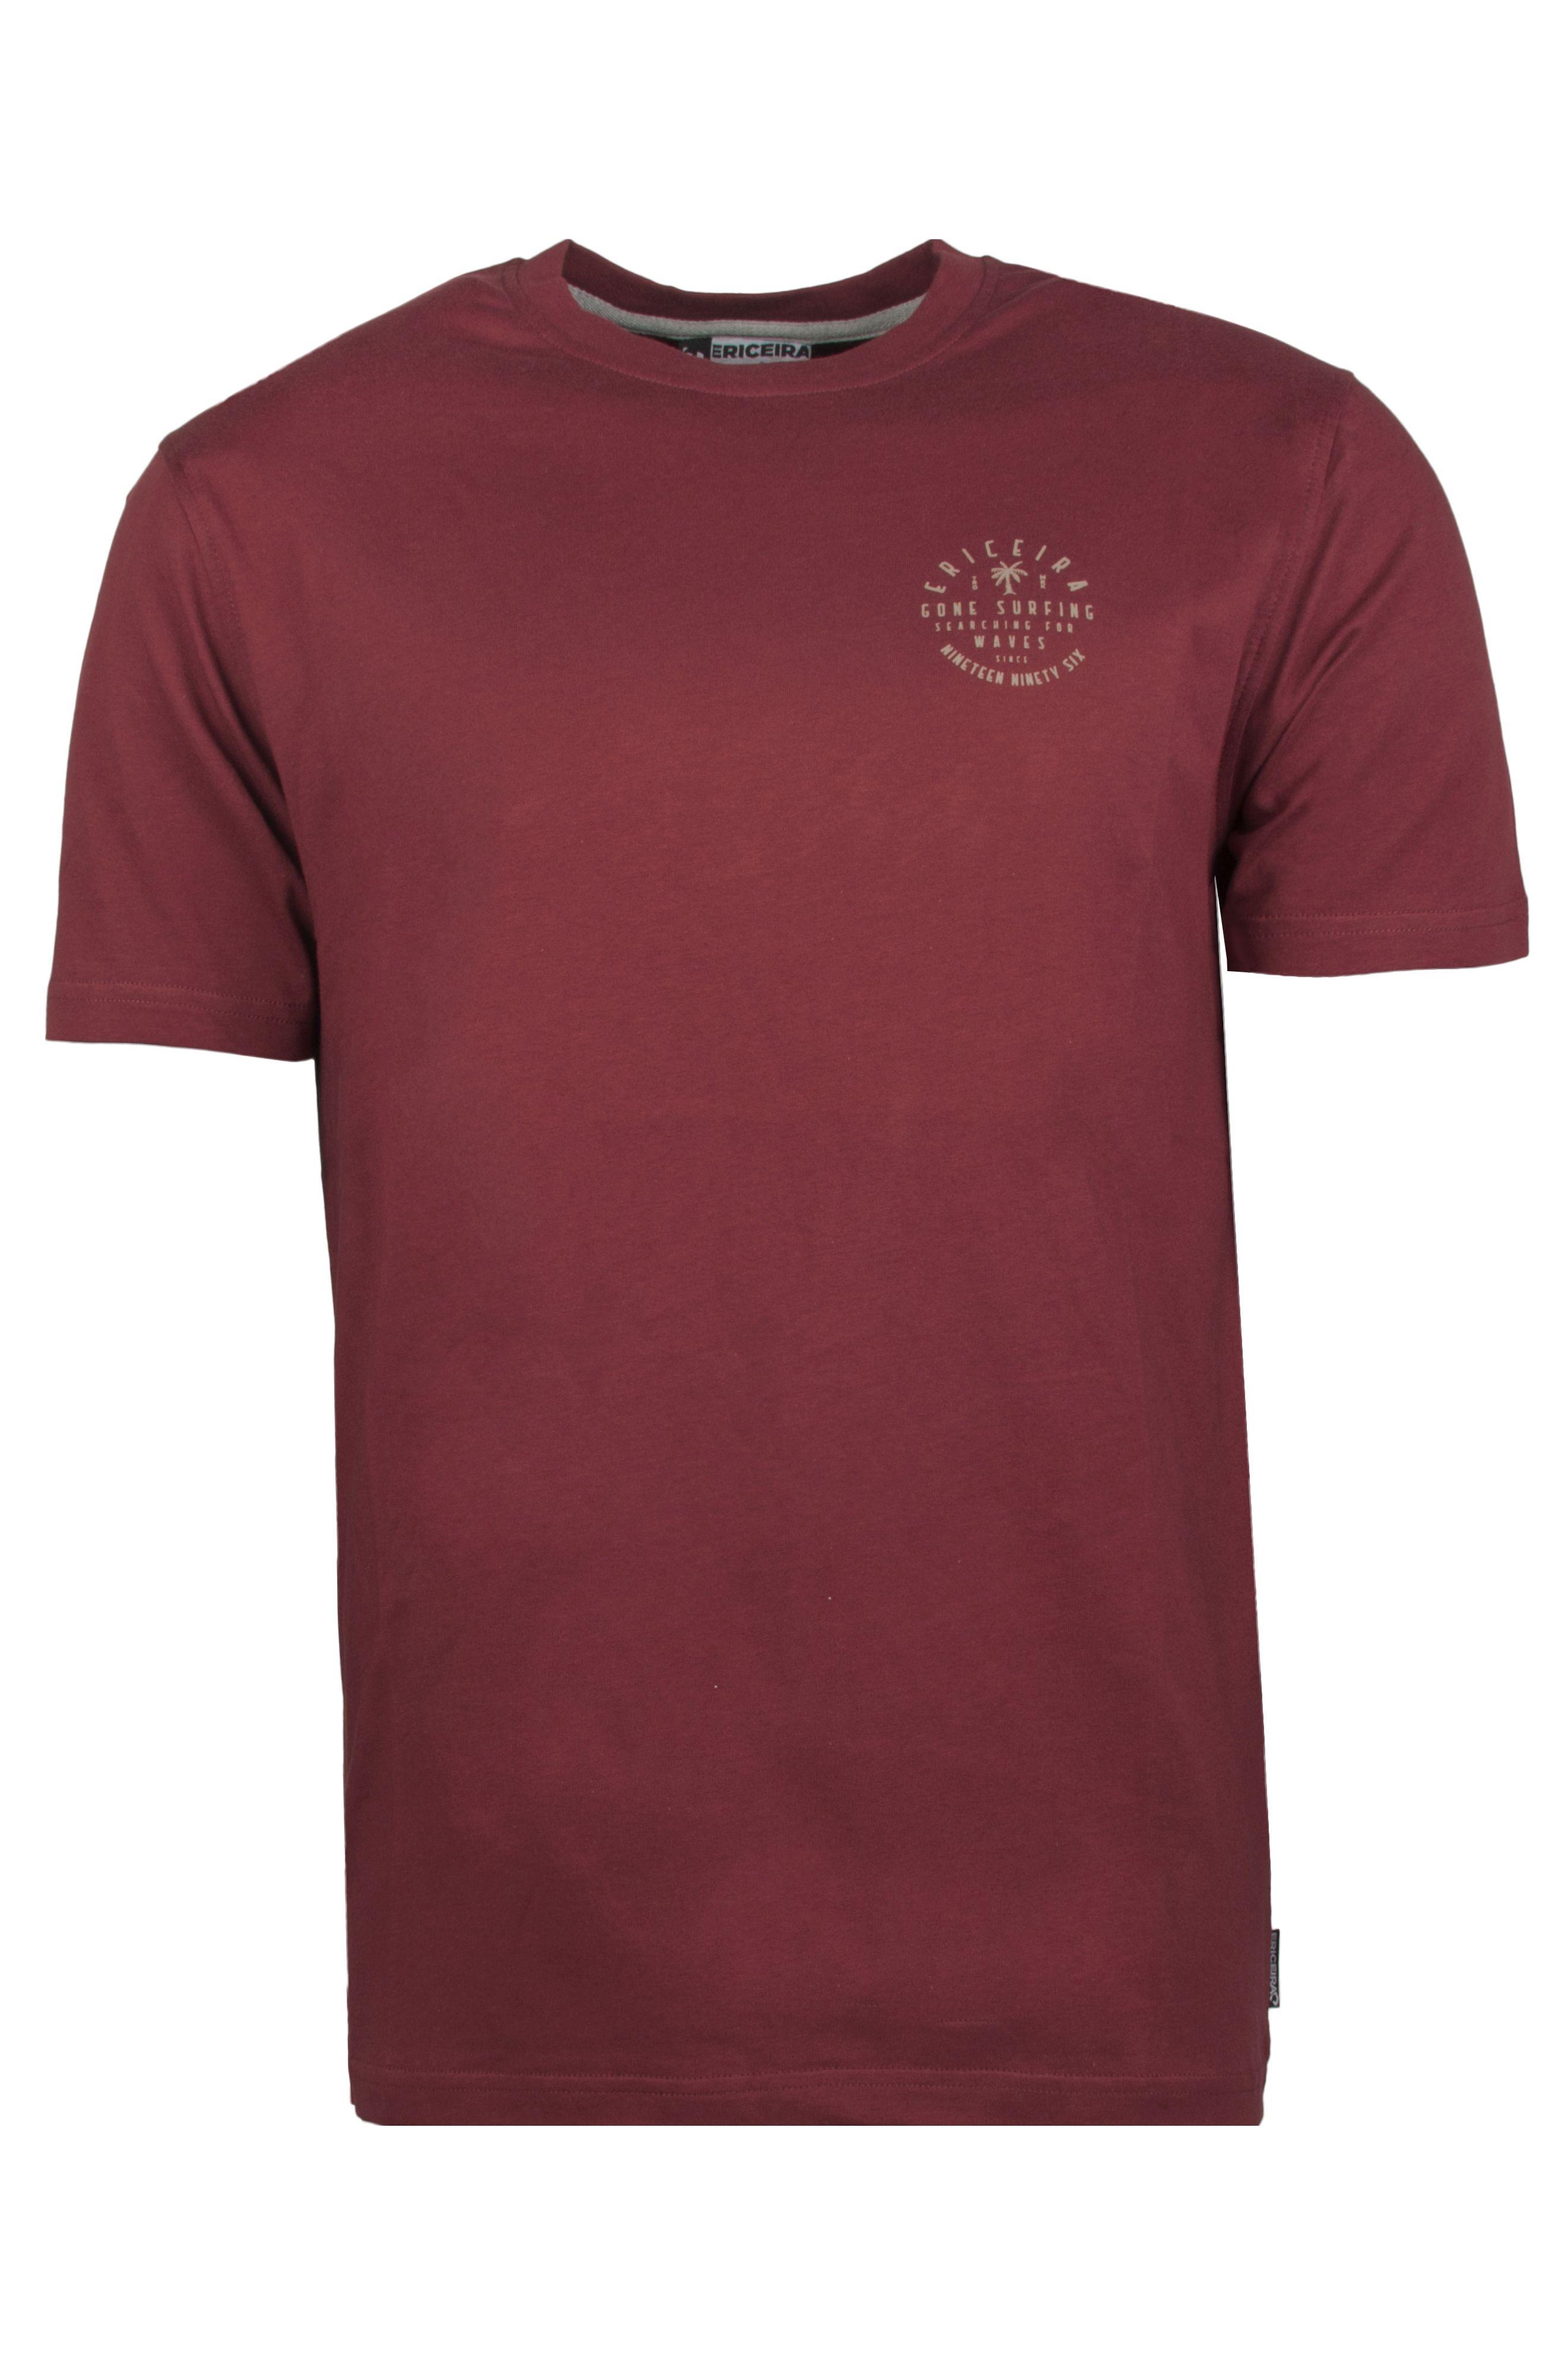 T-Shirt Ericeira Surf Skate GRANADA Dark Ruby